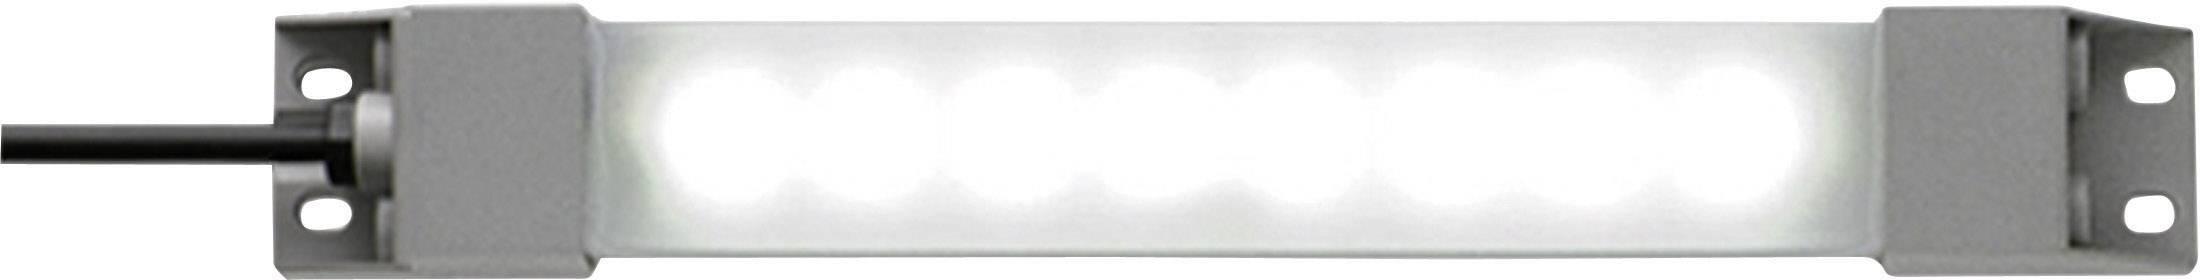 Idec LF1B-NB4P-2THWW2-3M, biela, 160 lm, 2.9 W, 24 V/DC